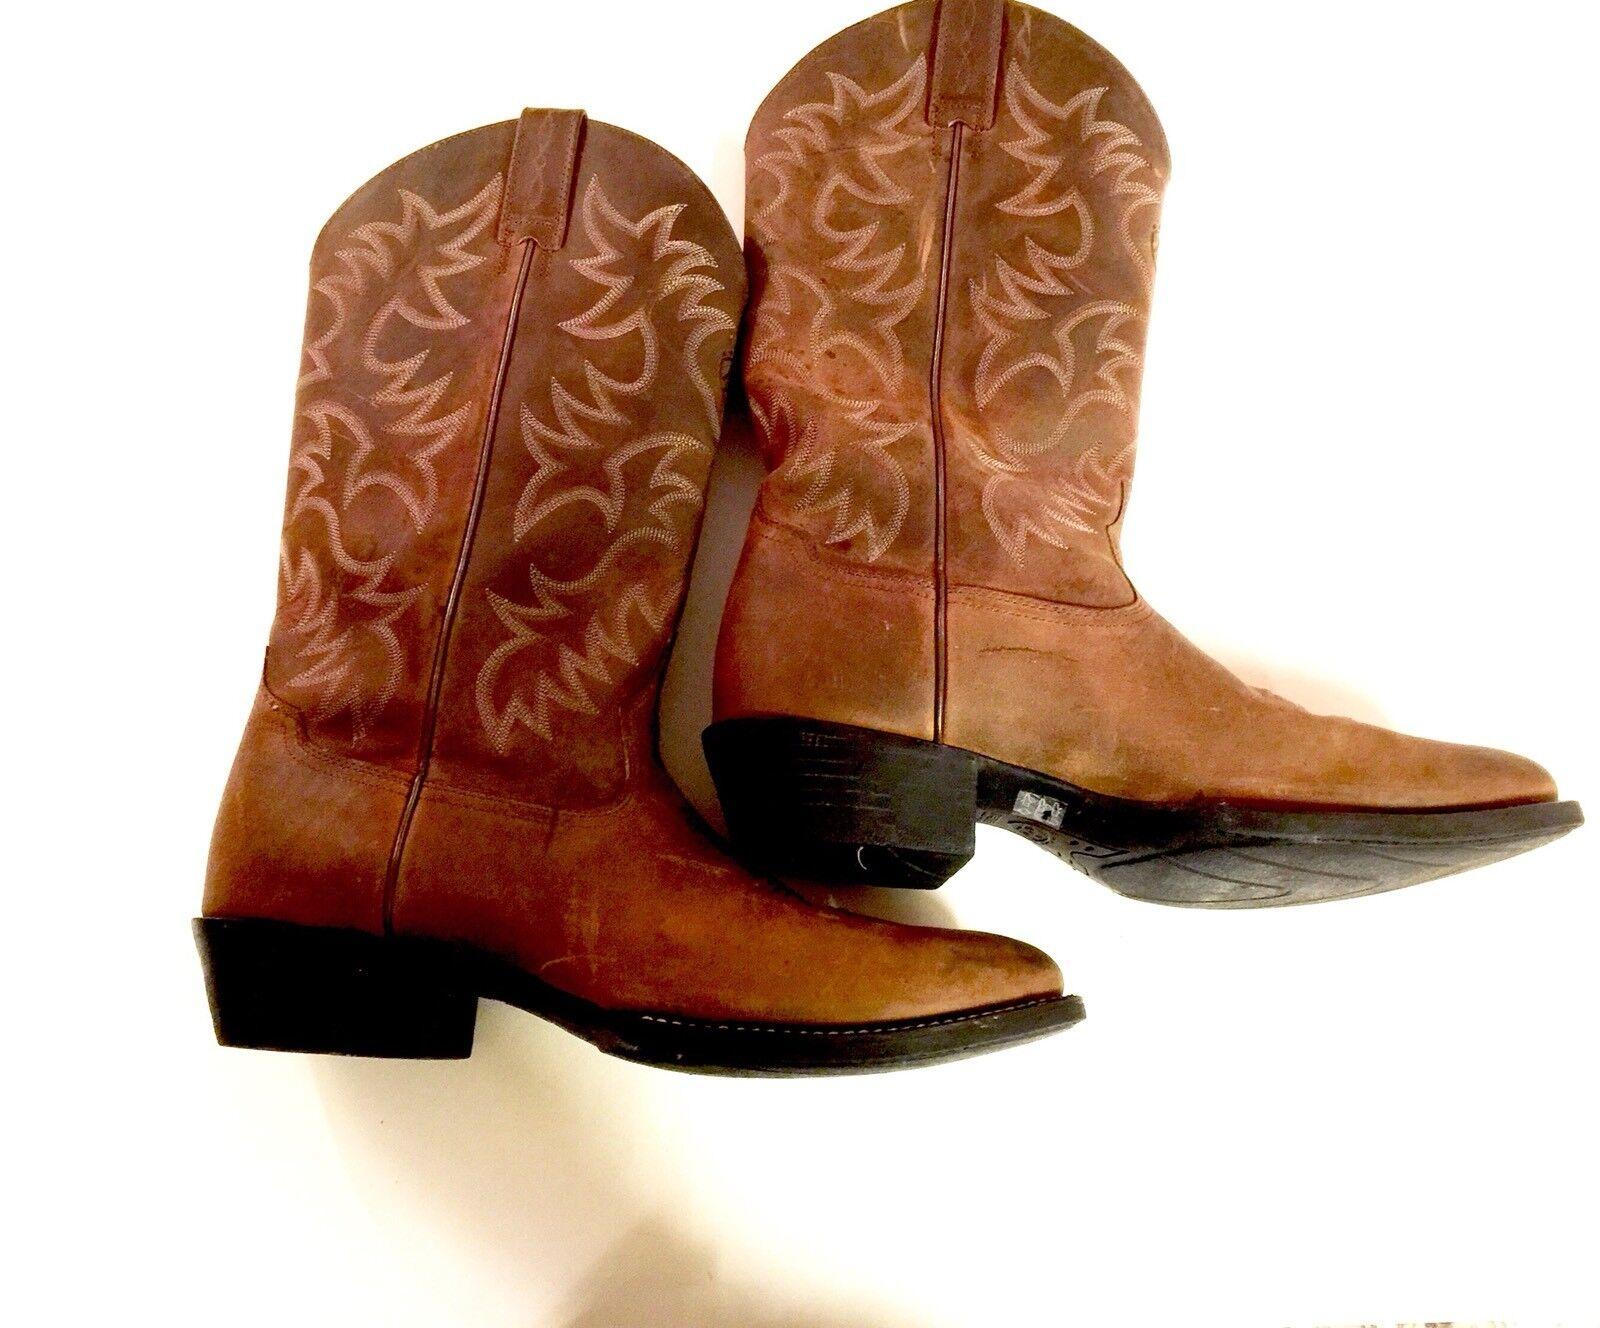 Ariat Ariat Ariat Uomo Heritage R Toe Cowboy Stivali Distressed Brown Size 12 D Worn Twice 7fdaf7